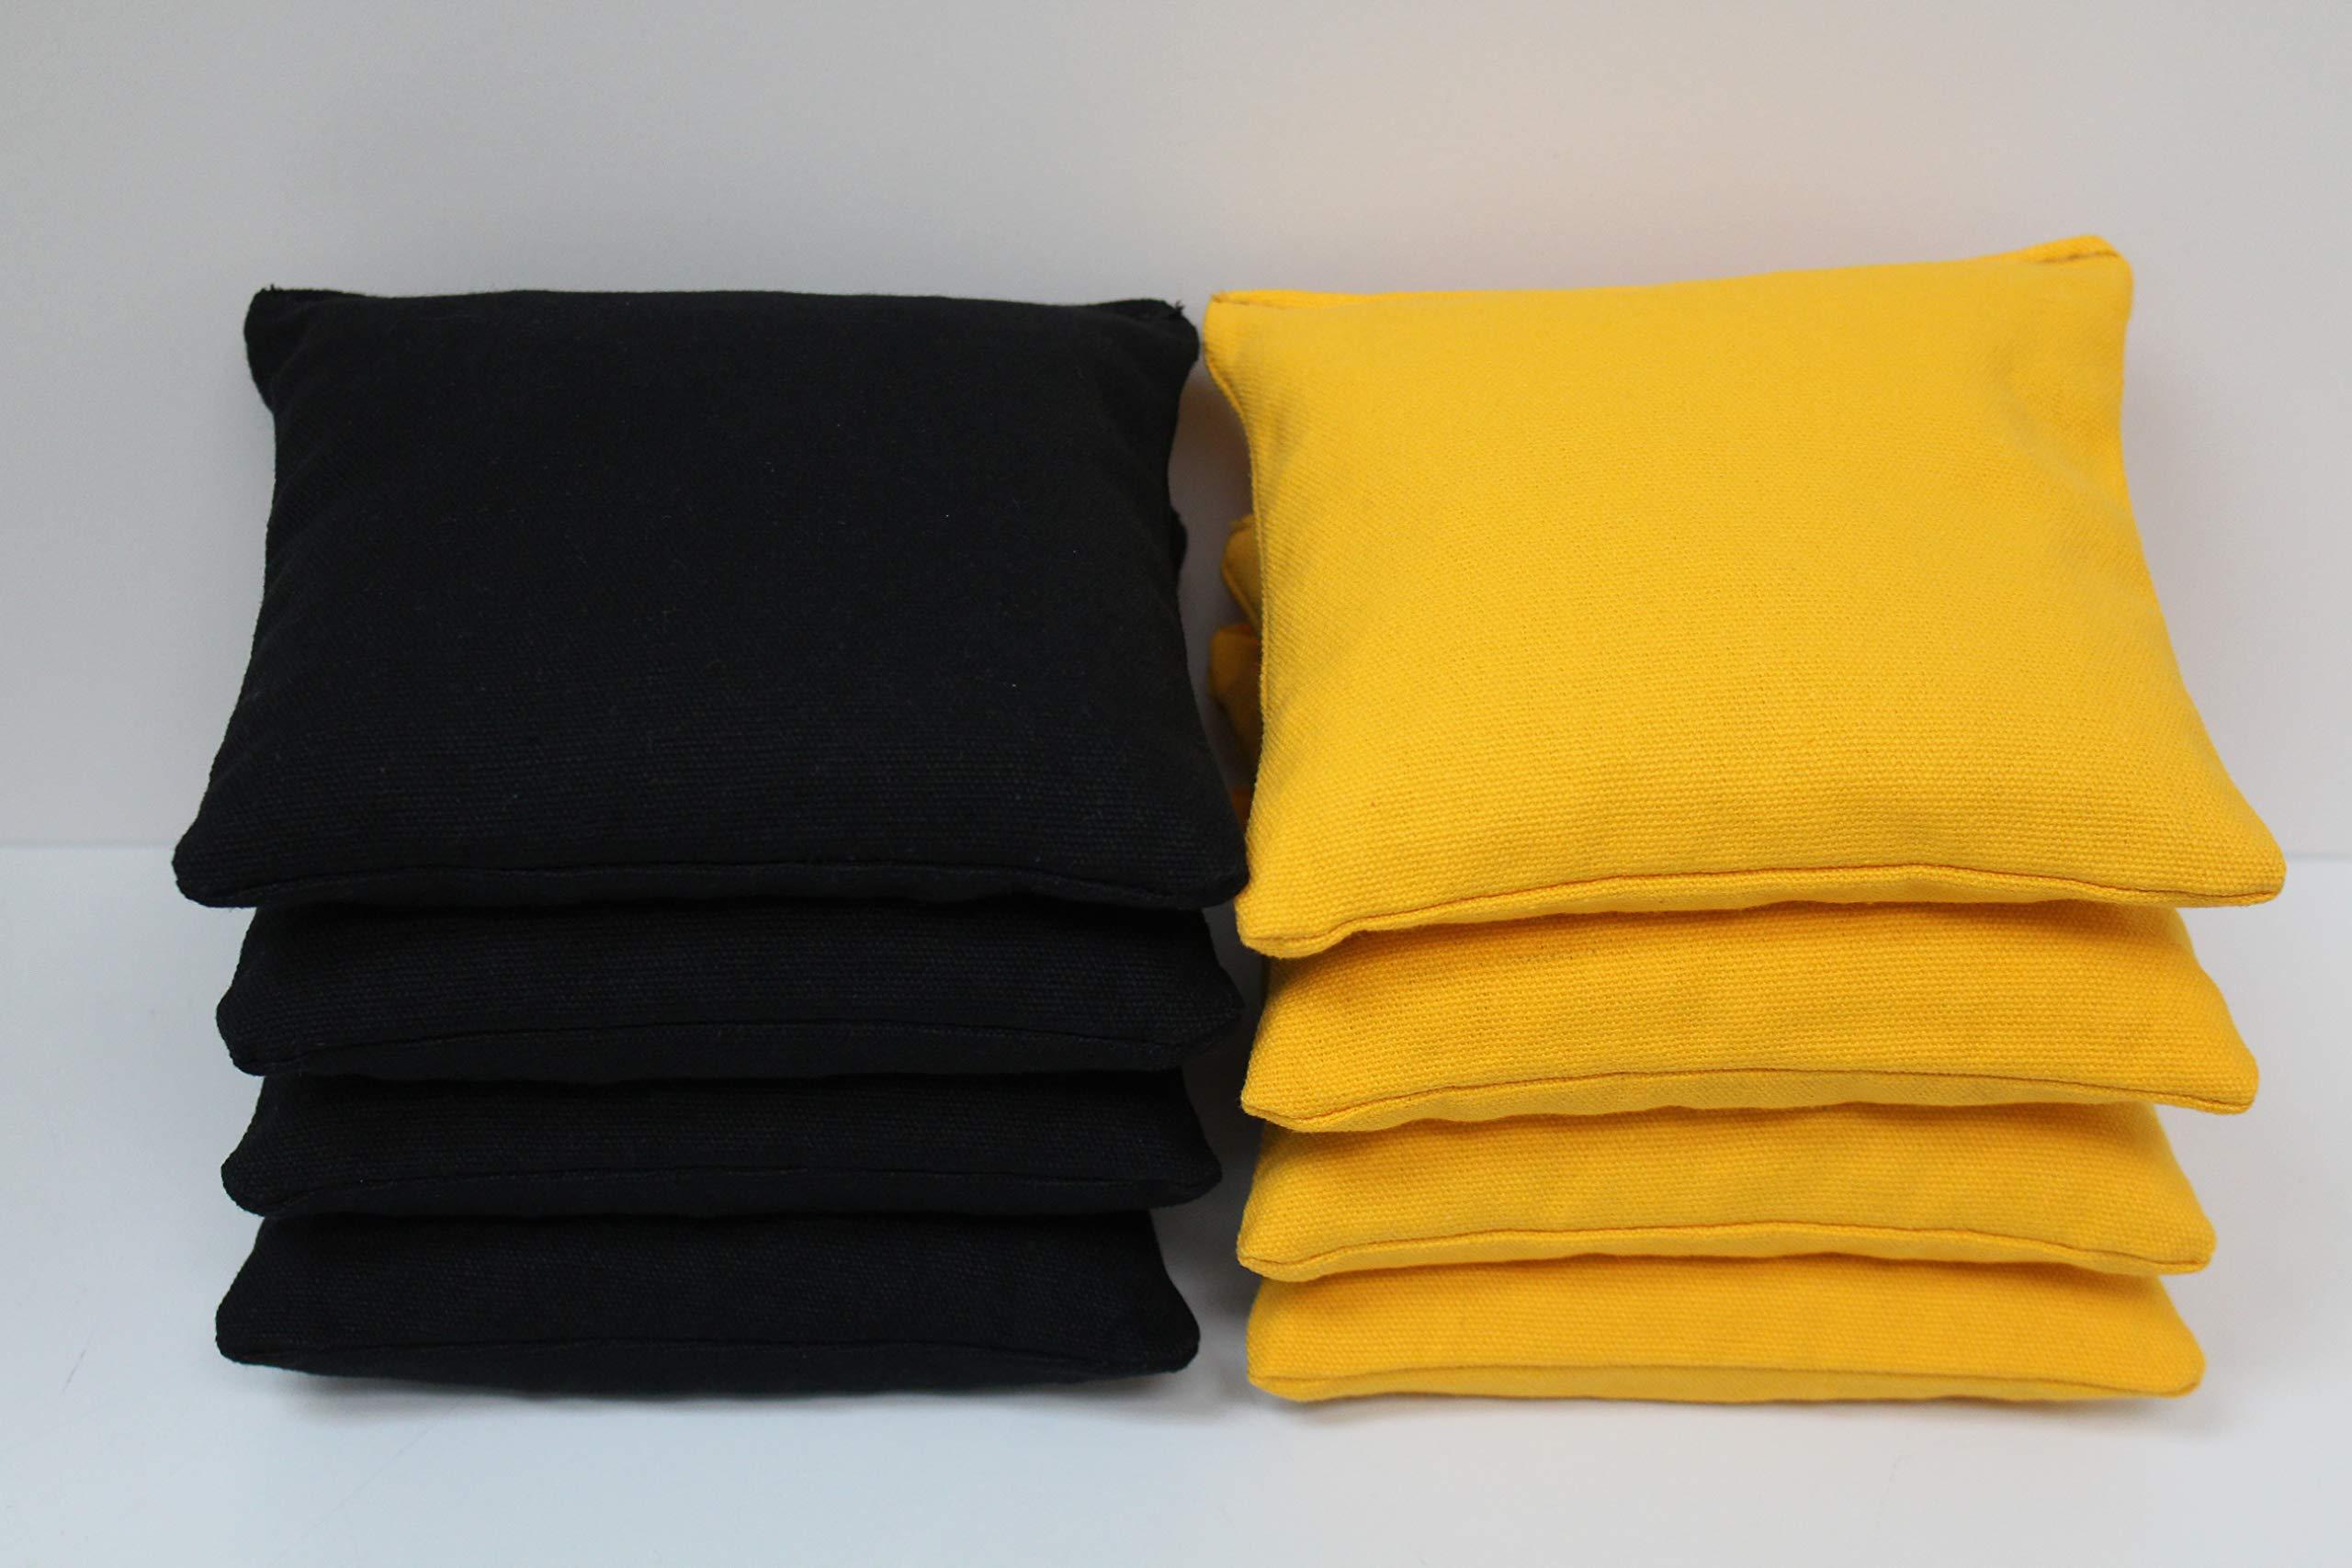 Cornhole Bags Set - (4 Black, 4 Yellow) By Free Donkey Sports by Free Donkey Sports